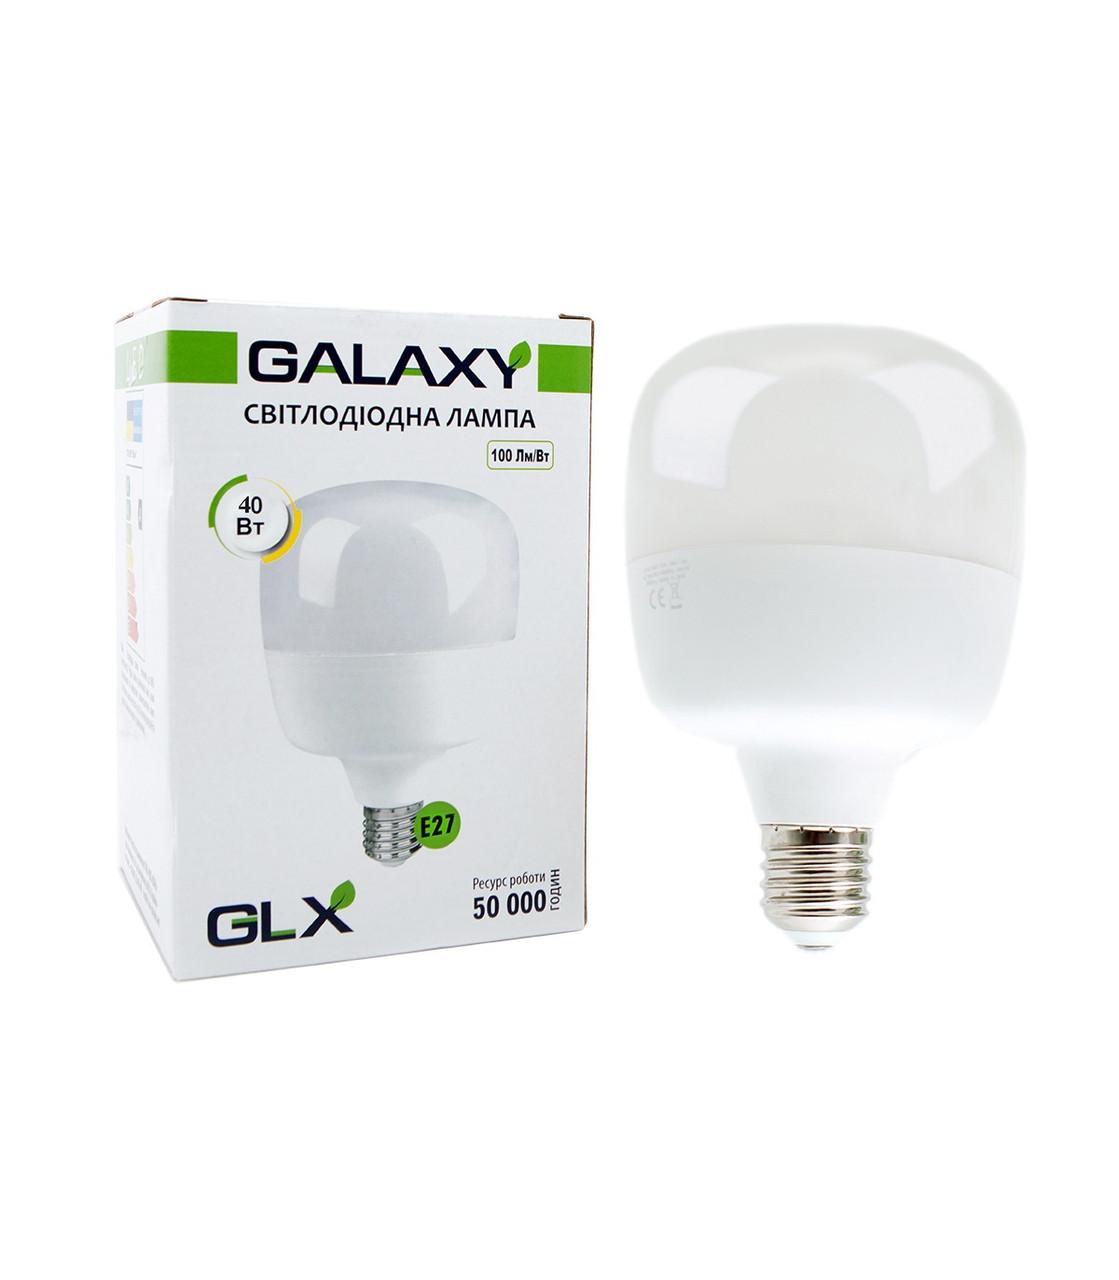 Лампа светодиодная Т100 40W Е27 5000K GLX